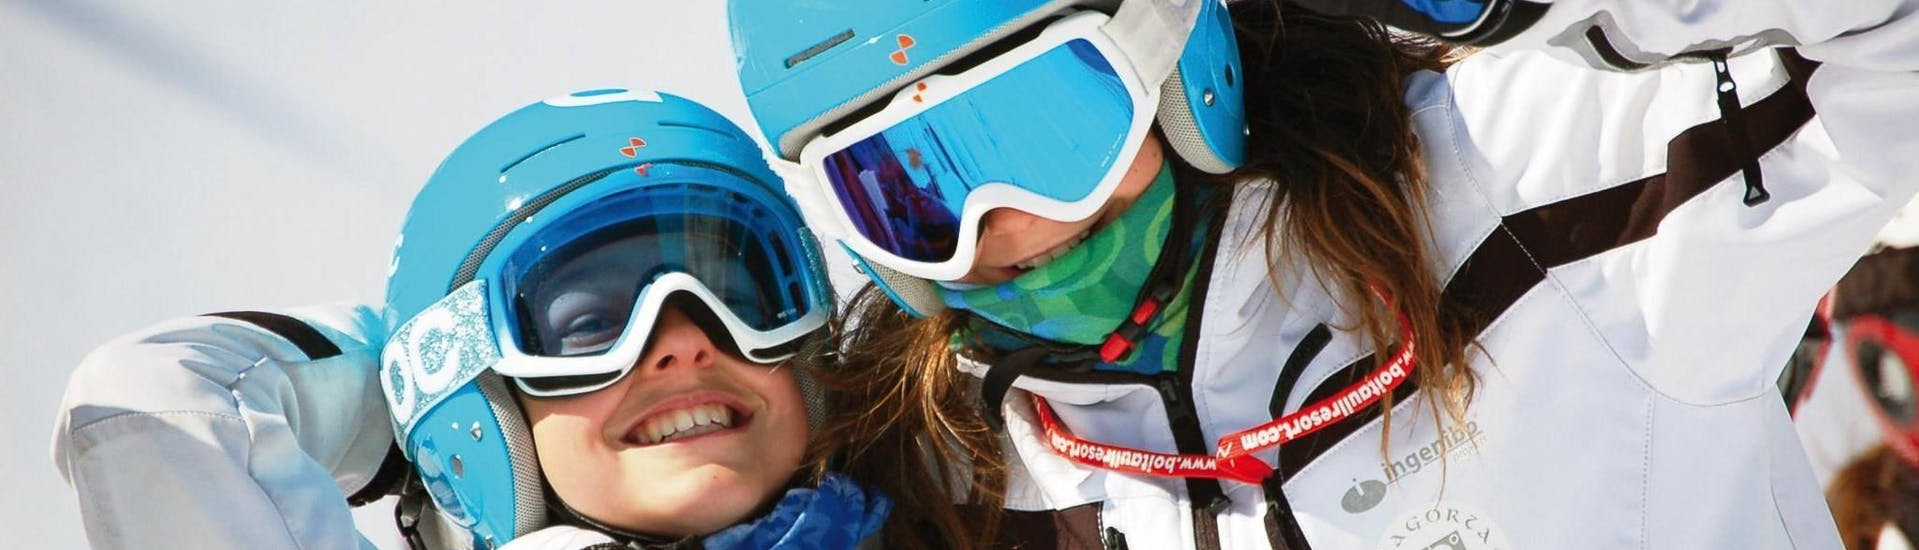 kids-ski-lessons-for-all-levels-escola-val-de-boi-hero-1